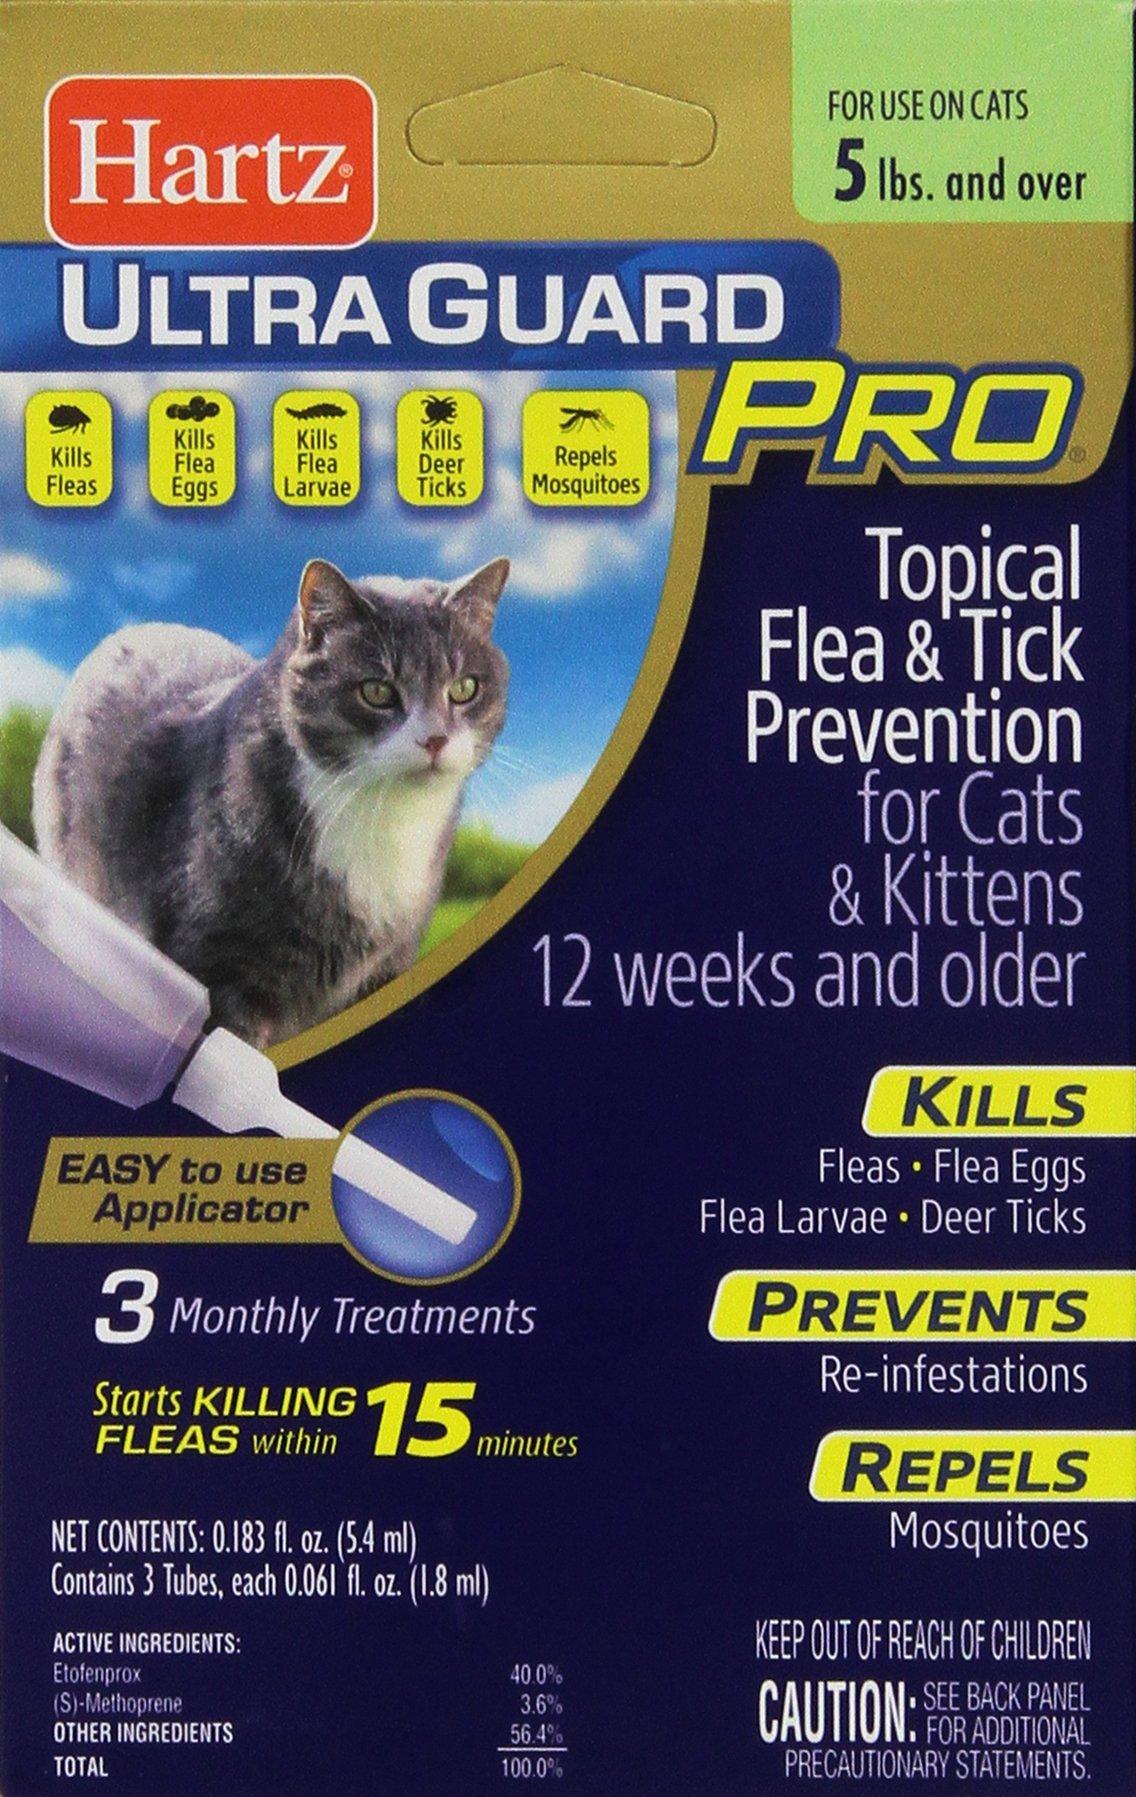 HARTZ UltraGuard Pro Flea & Tick Drops for Cats & Kittens - 3 Monthly Treatments